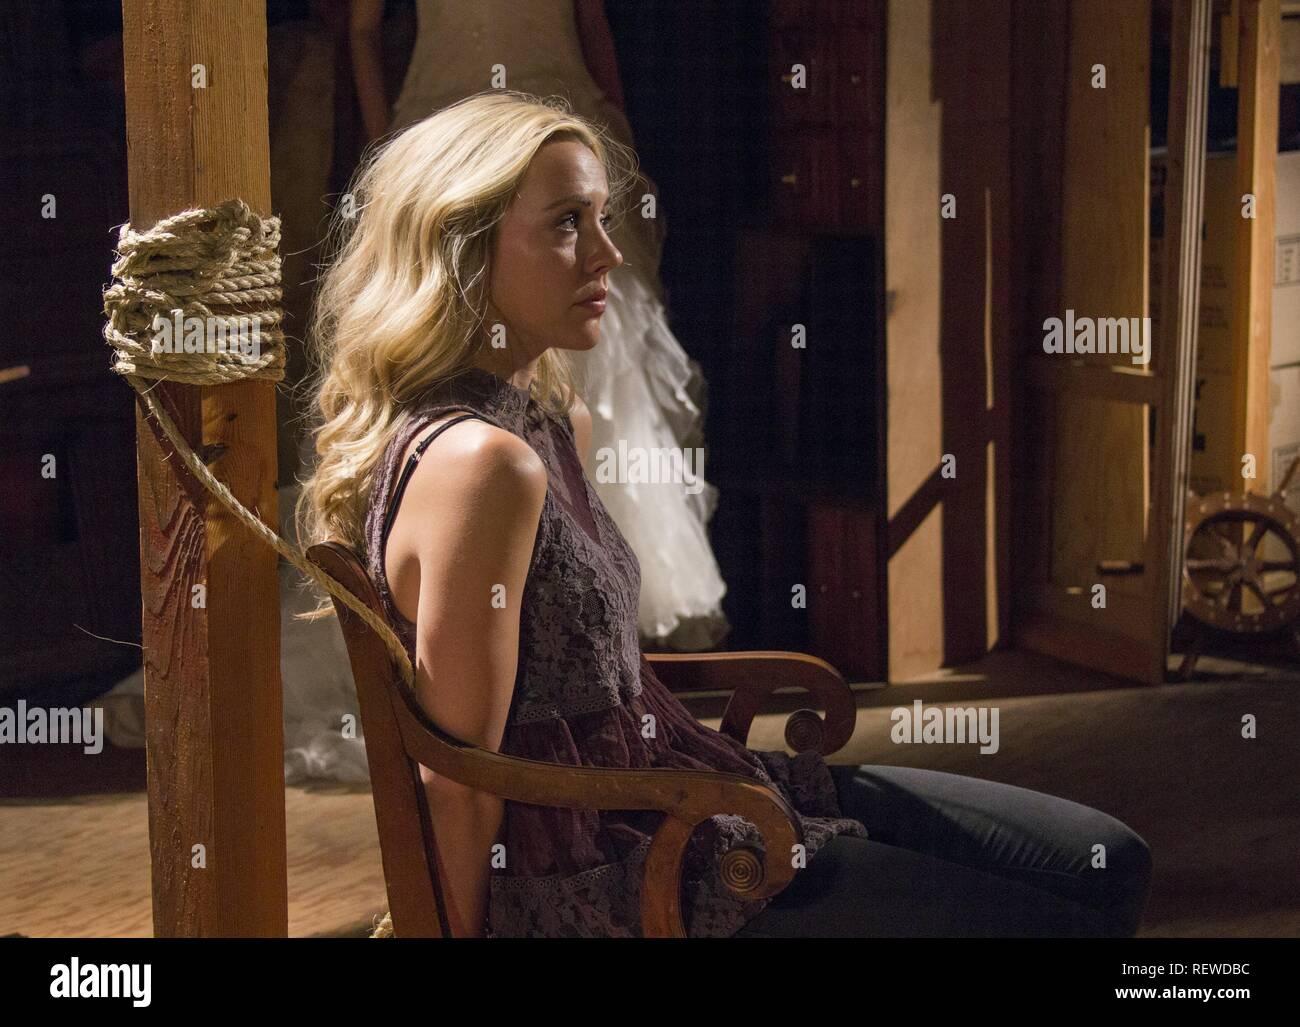 SAMANTHA COPE STORAGE LOCKER 181 (2016) - Stock Image